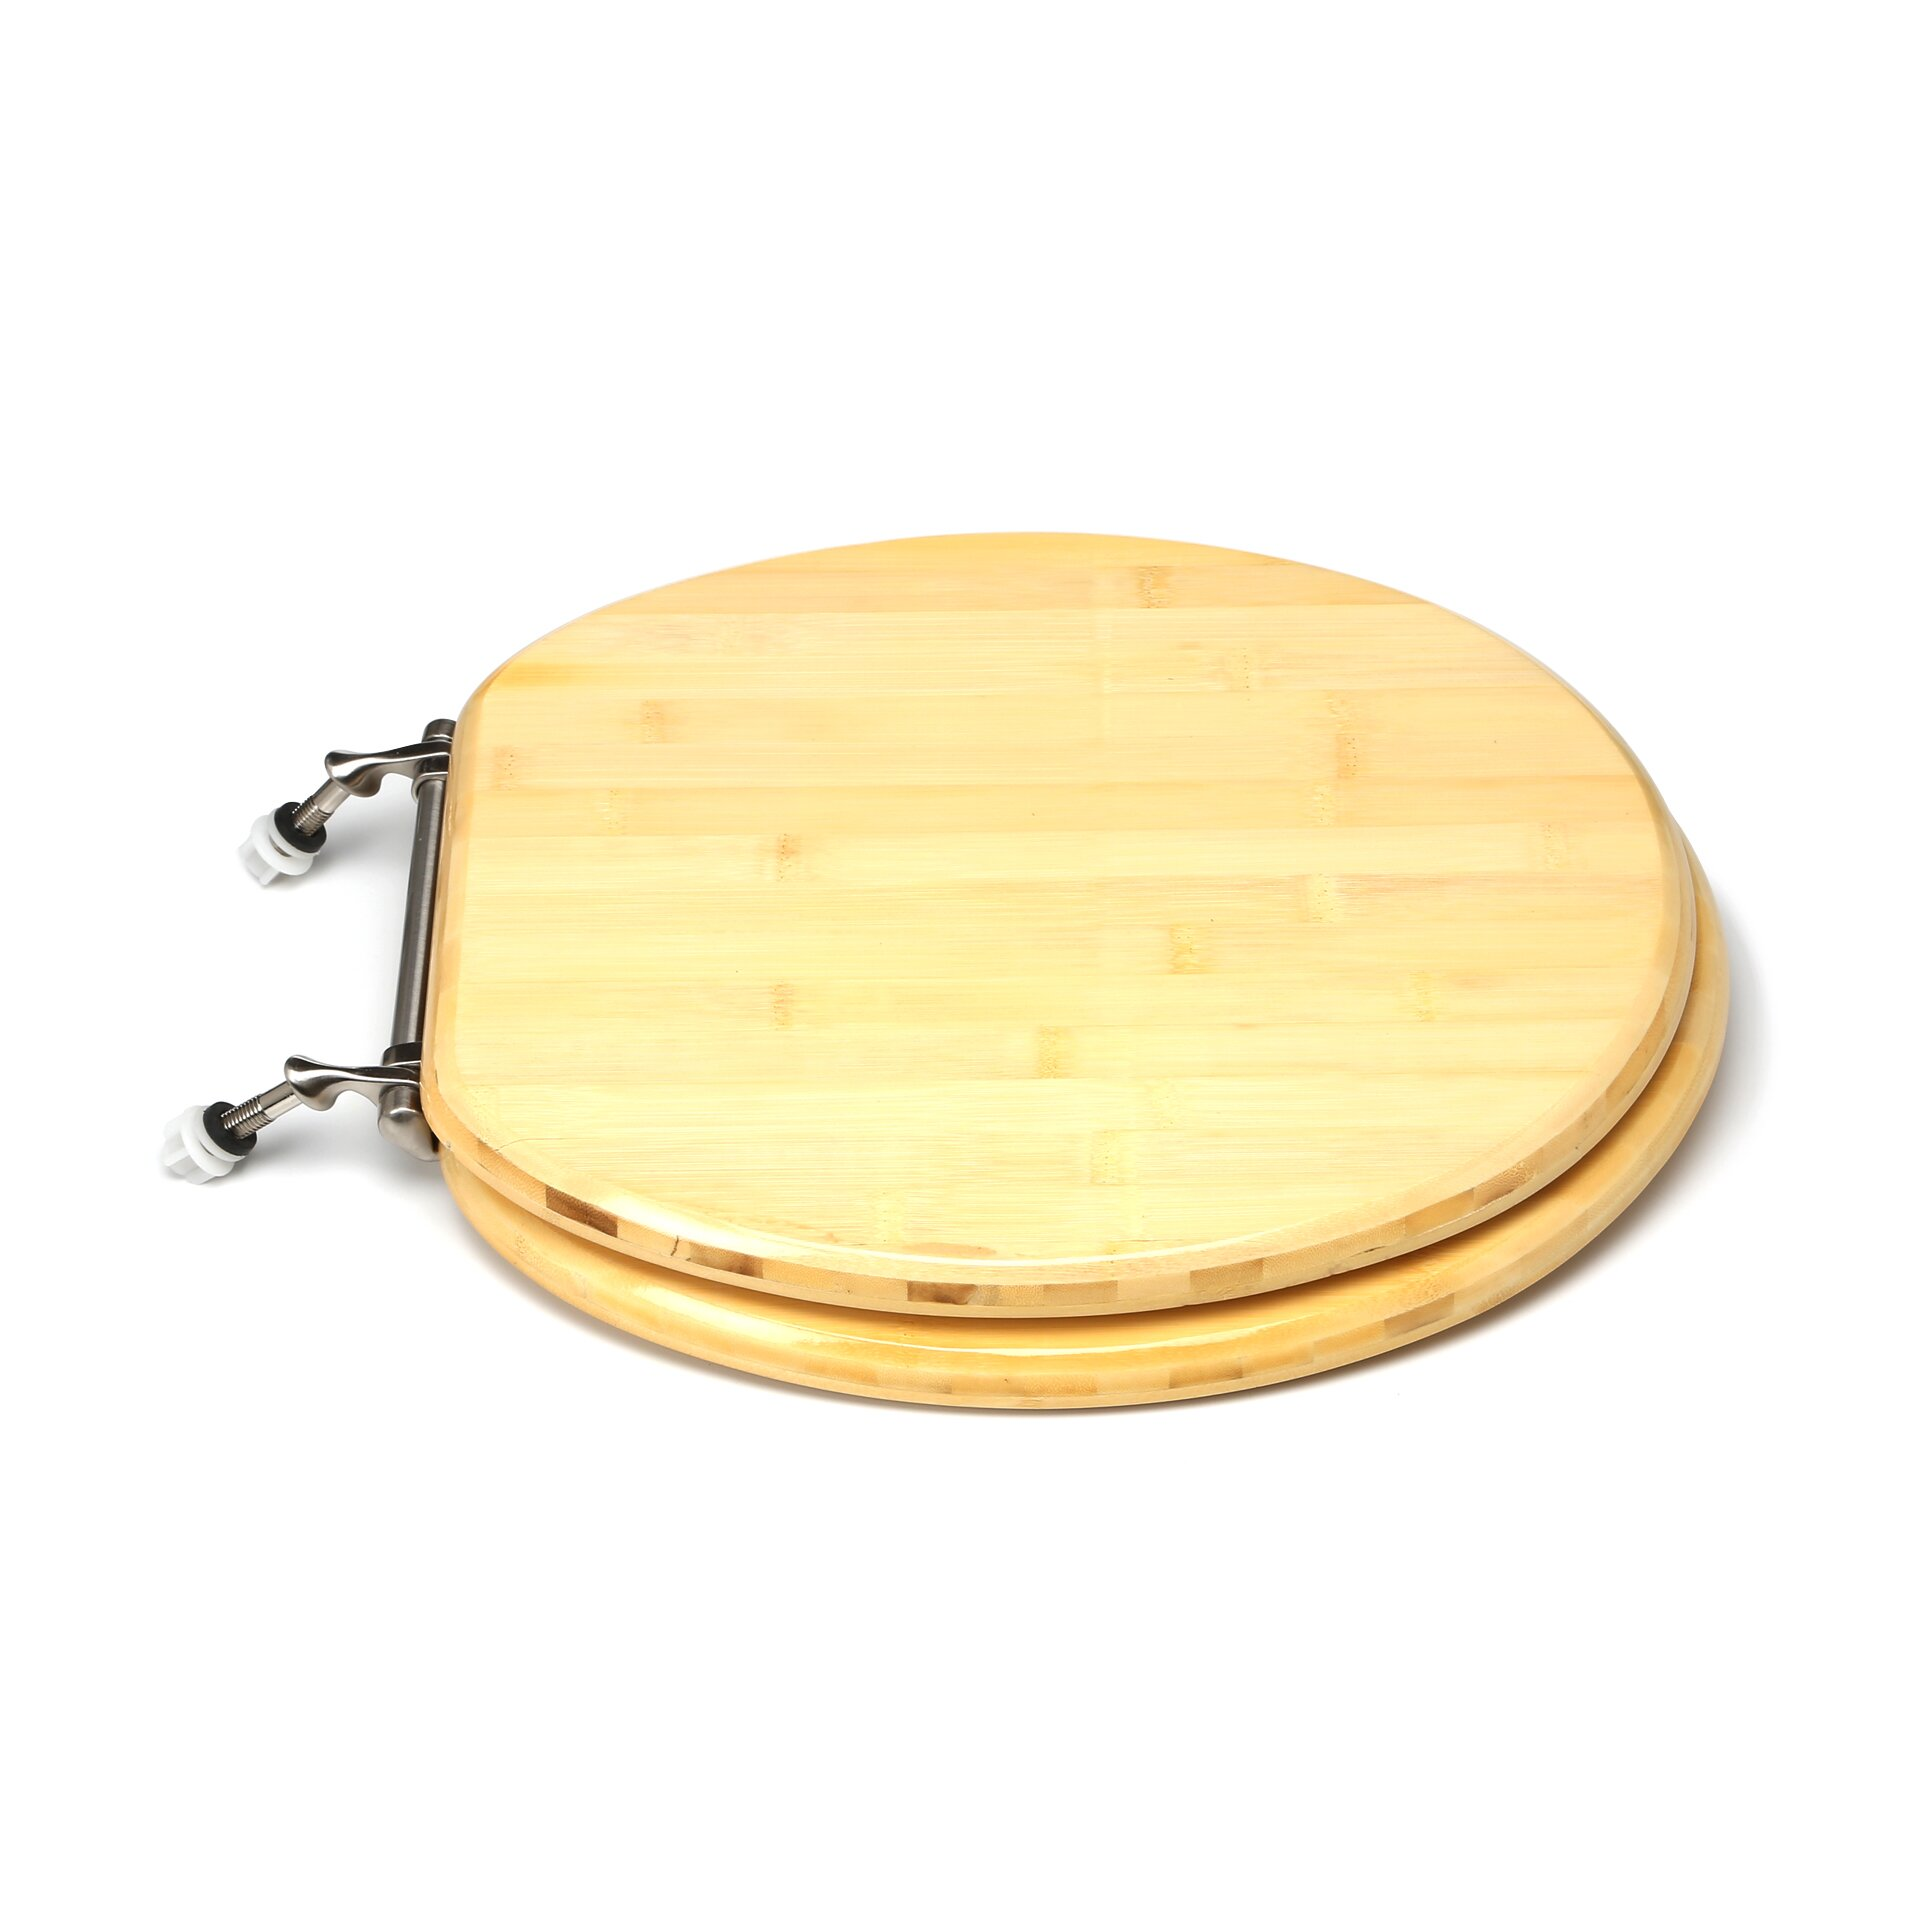 Comfort Seats Premium Piano Wood Round Toilet Seat Reviews Wayfair